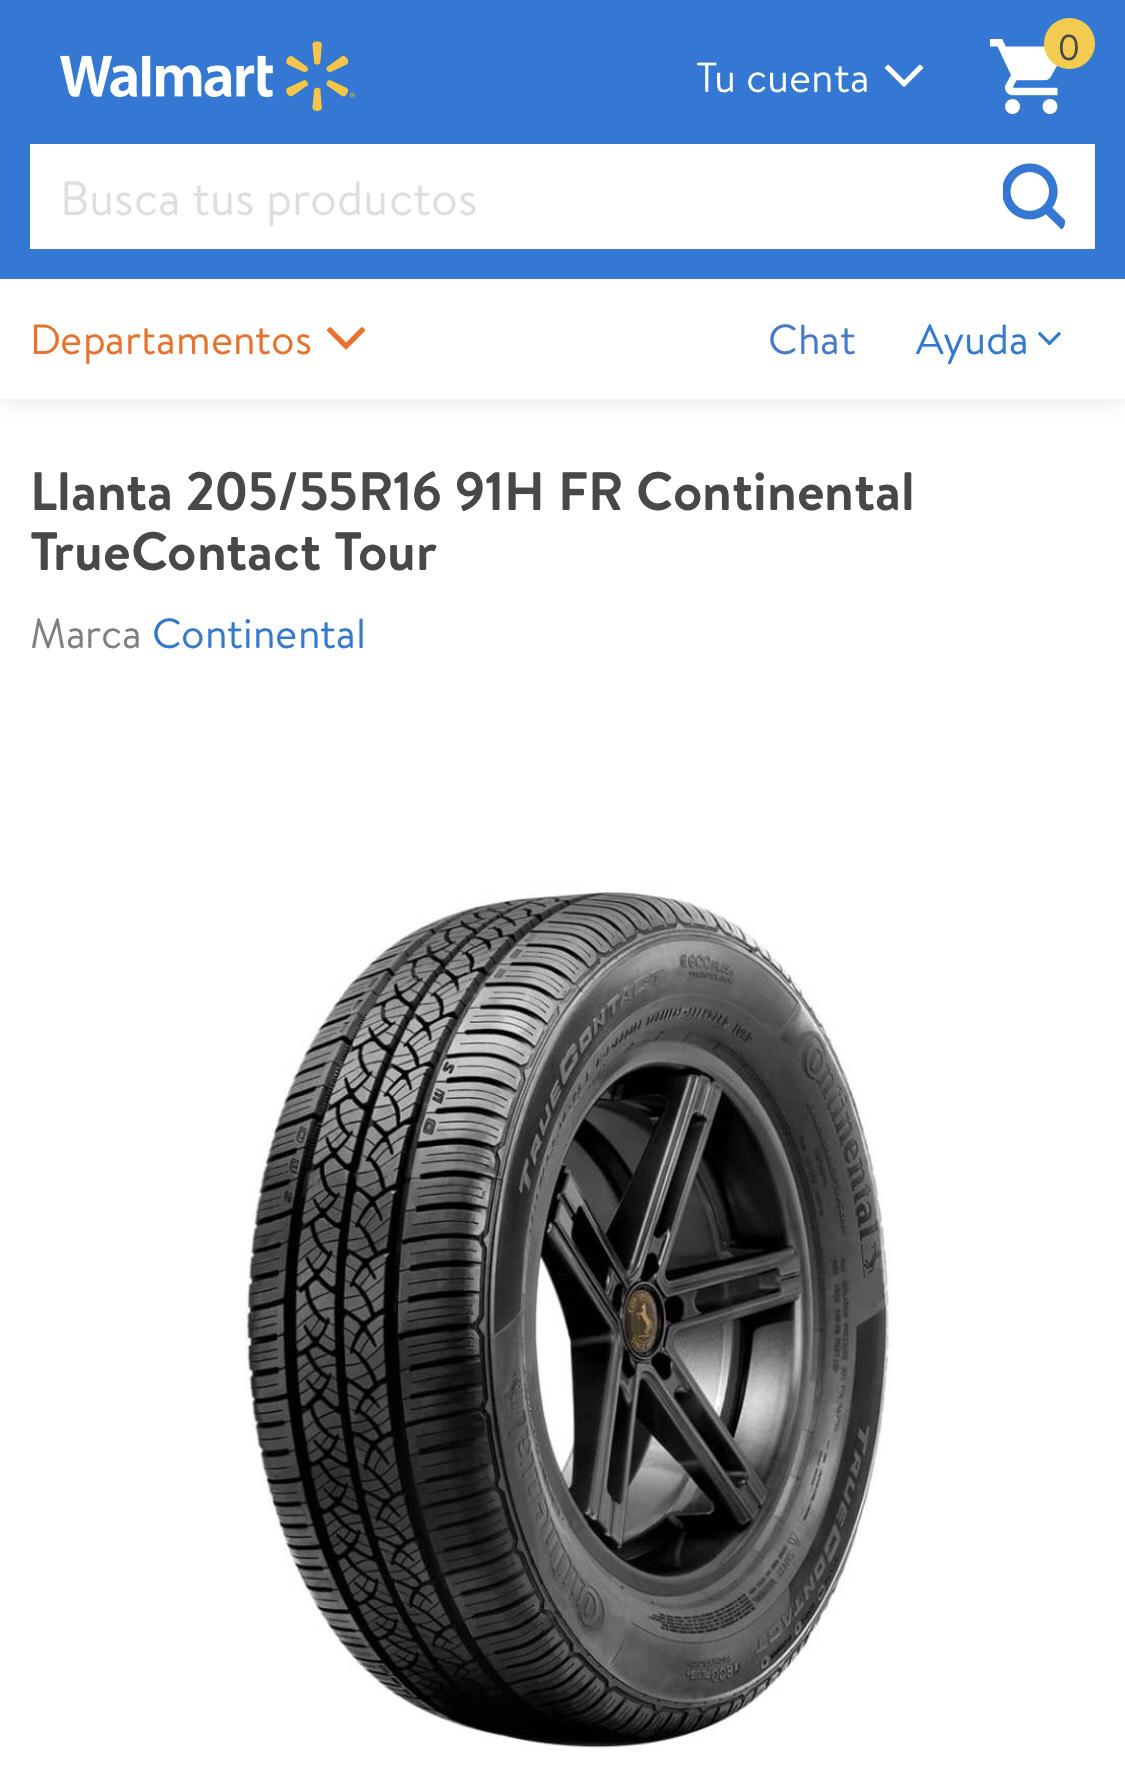 Walmart: 2 Llantas Continental 205/55R16 91H FR